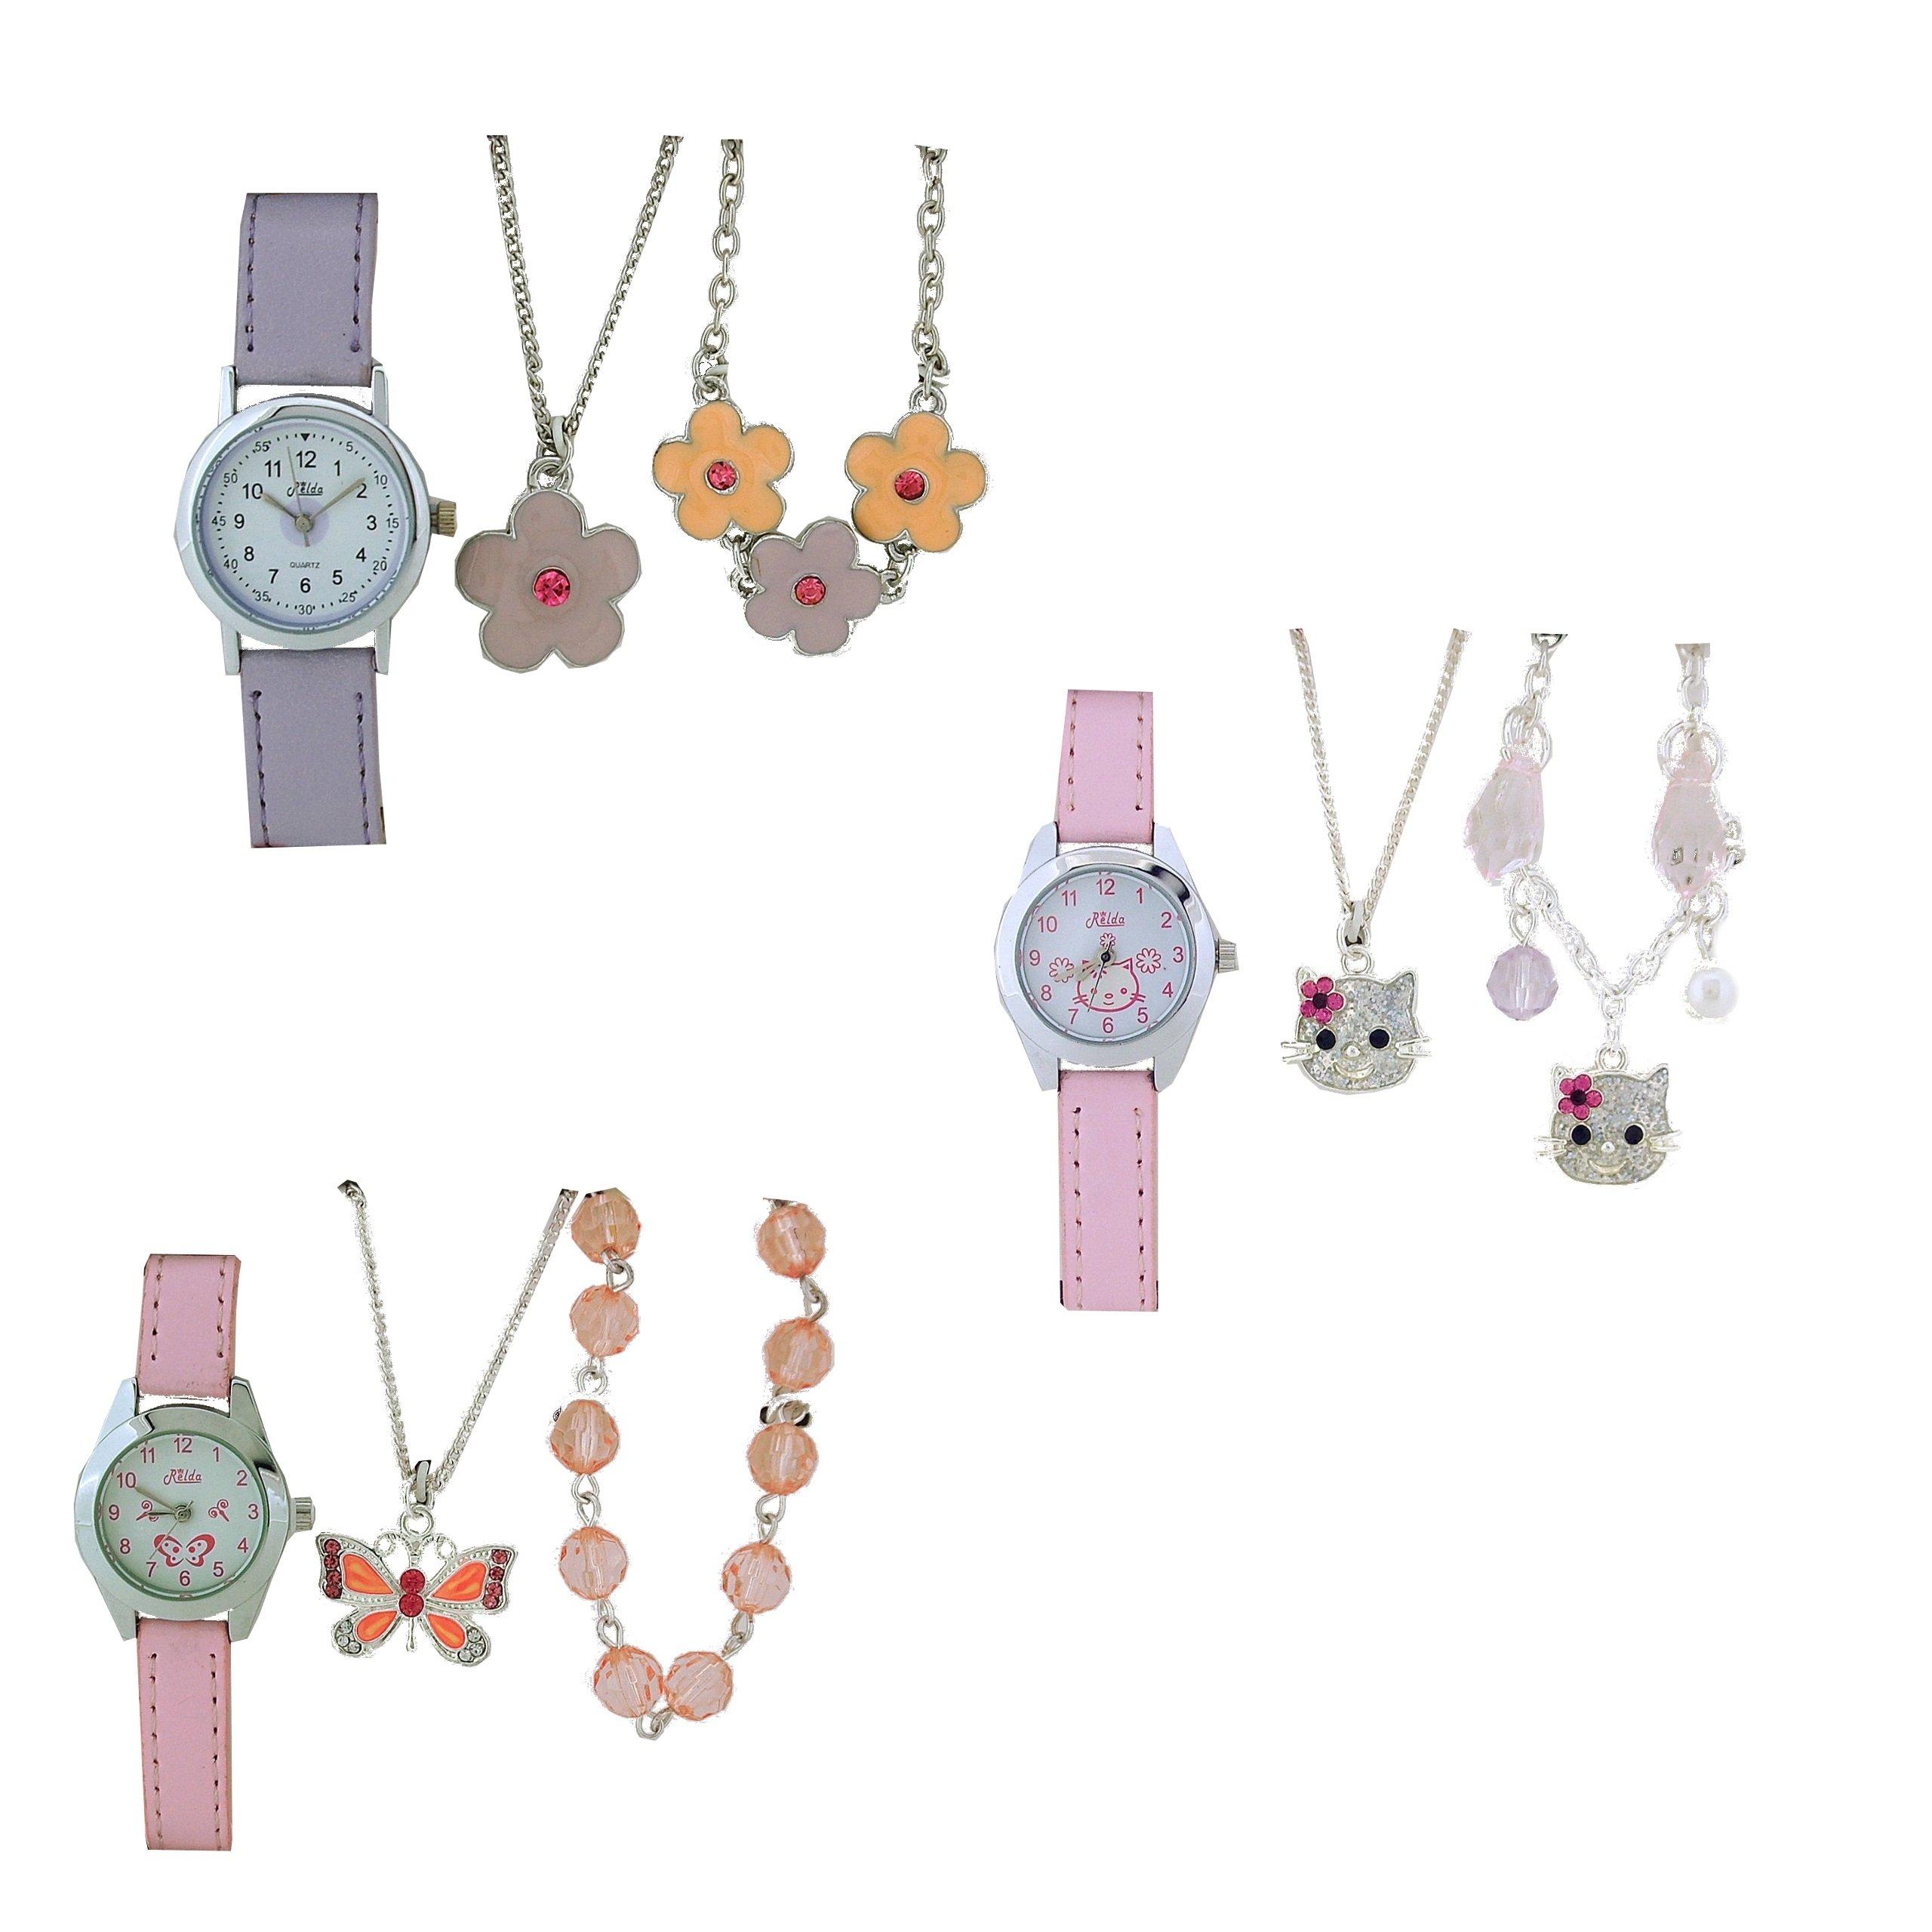 Relda Kids Watch & Jewellery Gift Set - Pack of 3 Designs Rel52